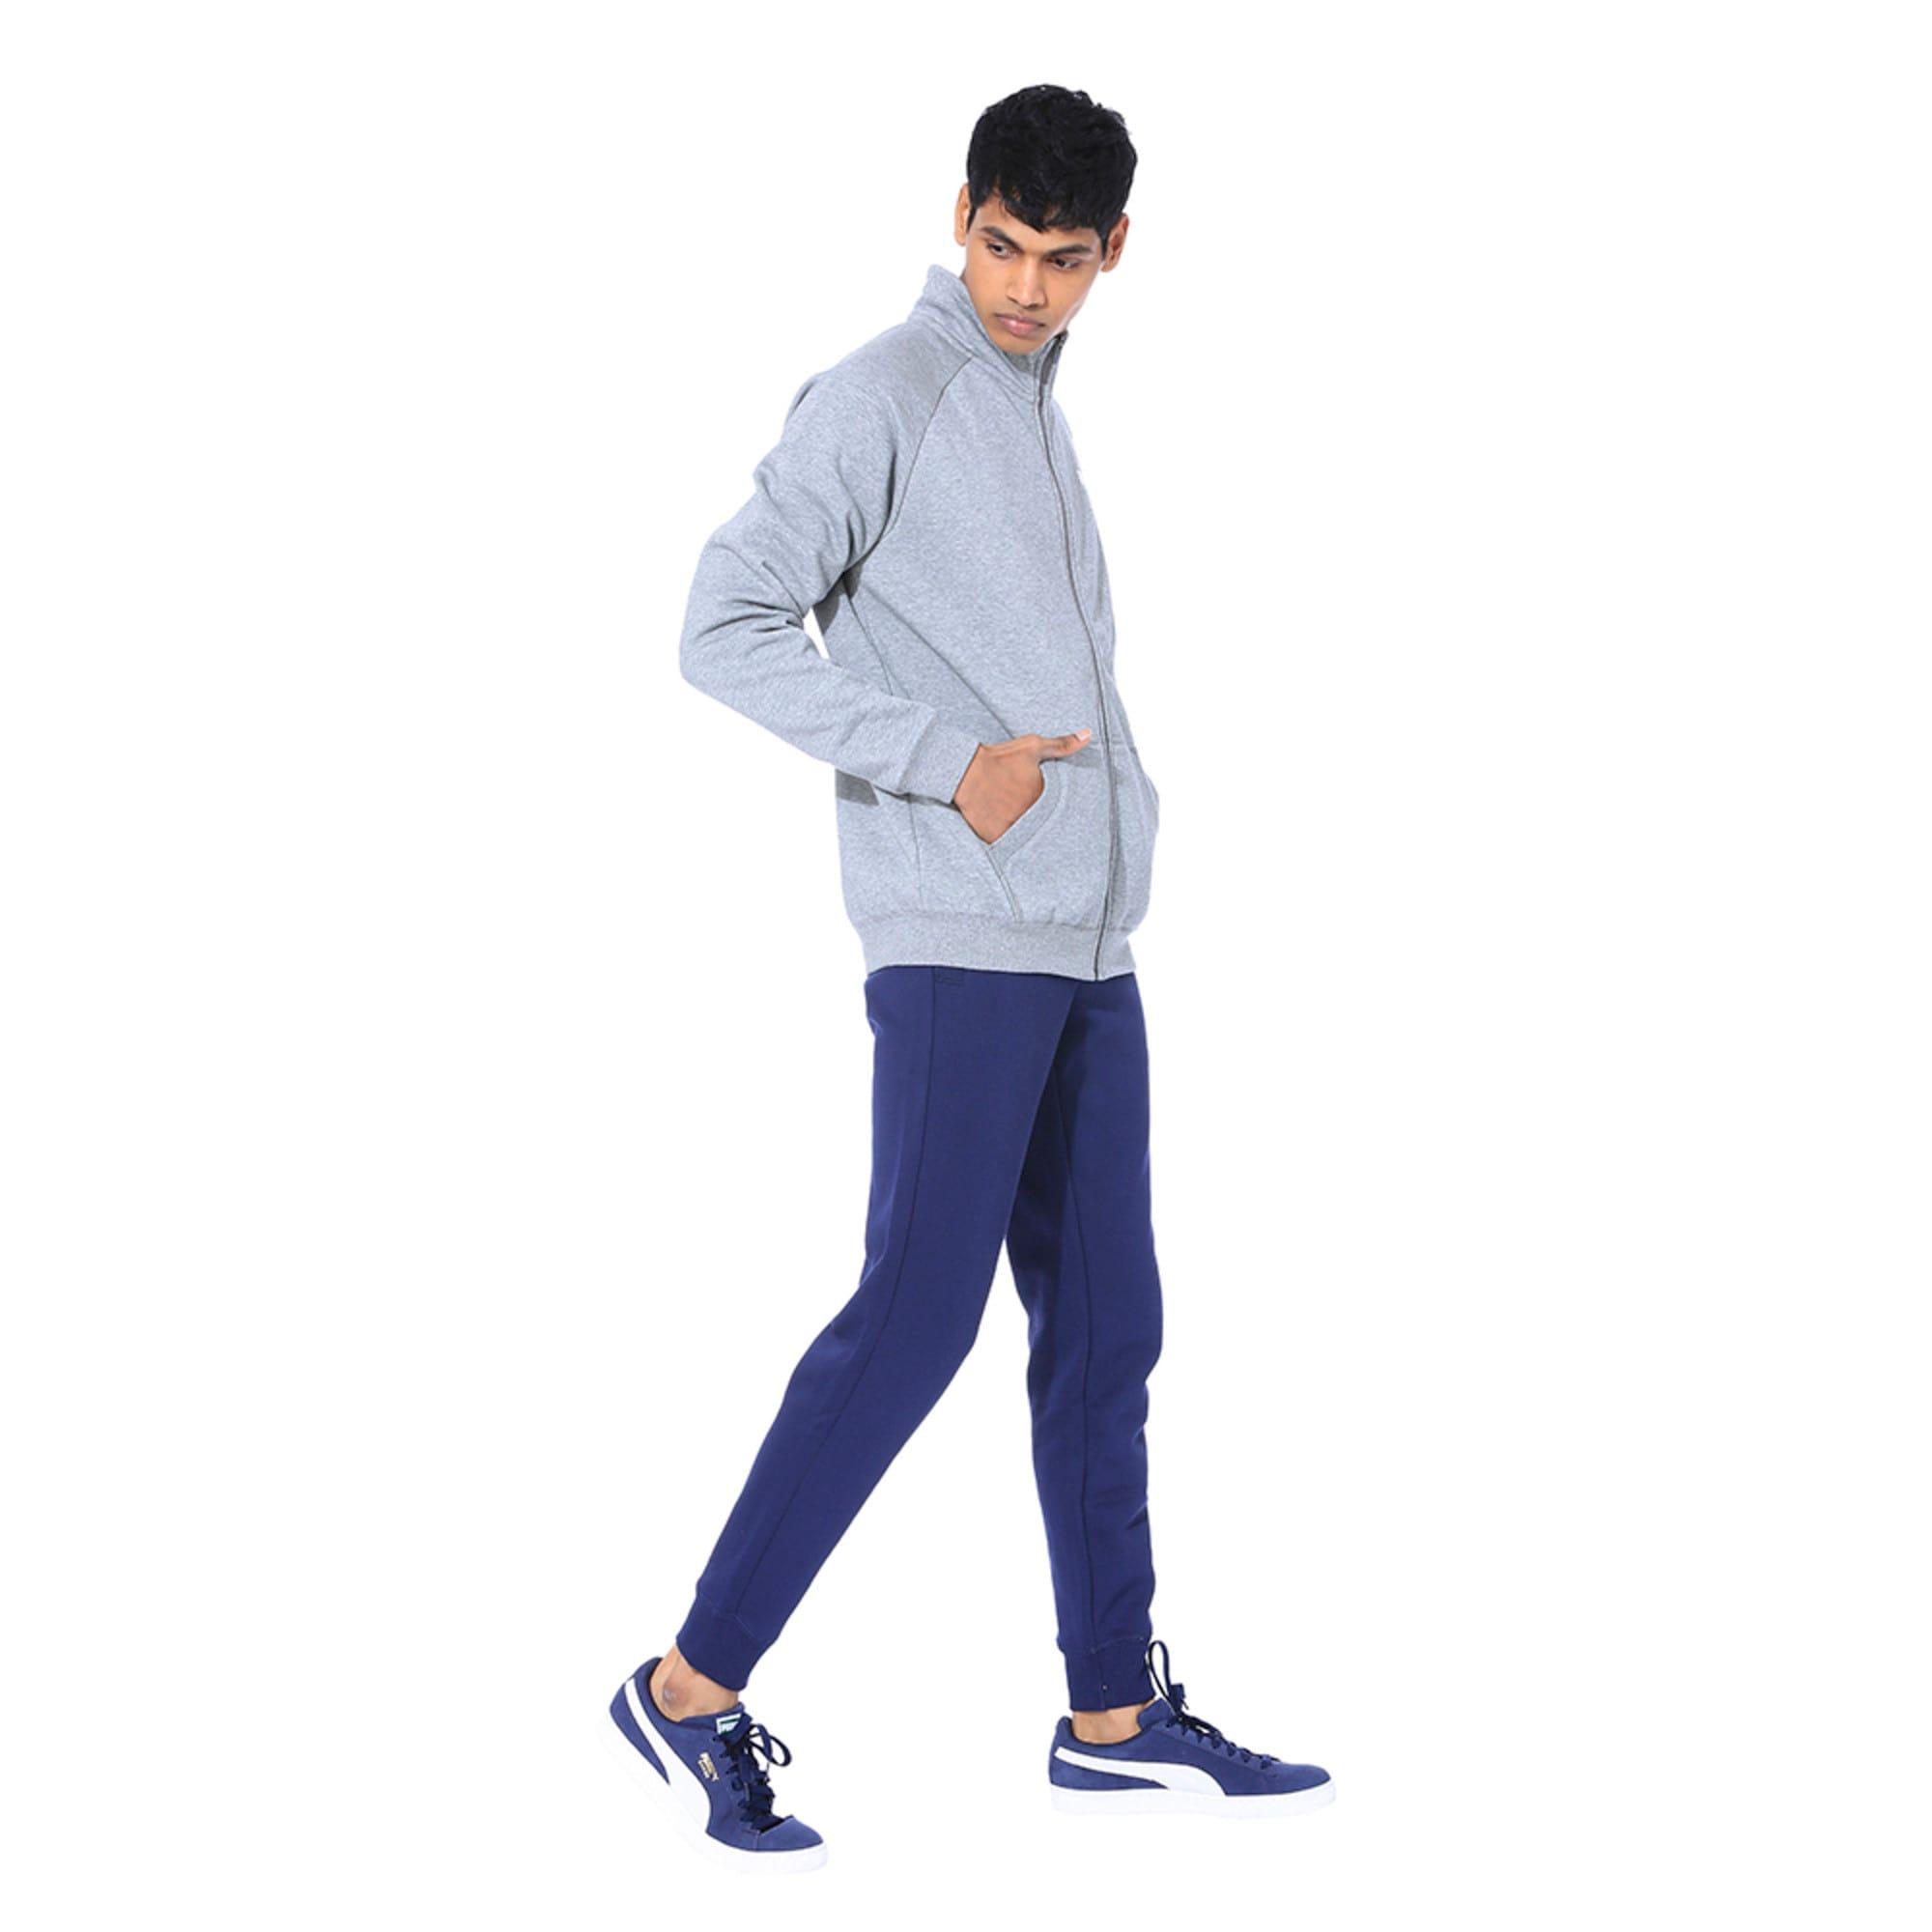 Thumbnail 2 of Clean CL Men's Sweat Suit, Medium Gray Heather, medium-IND